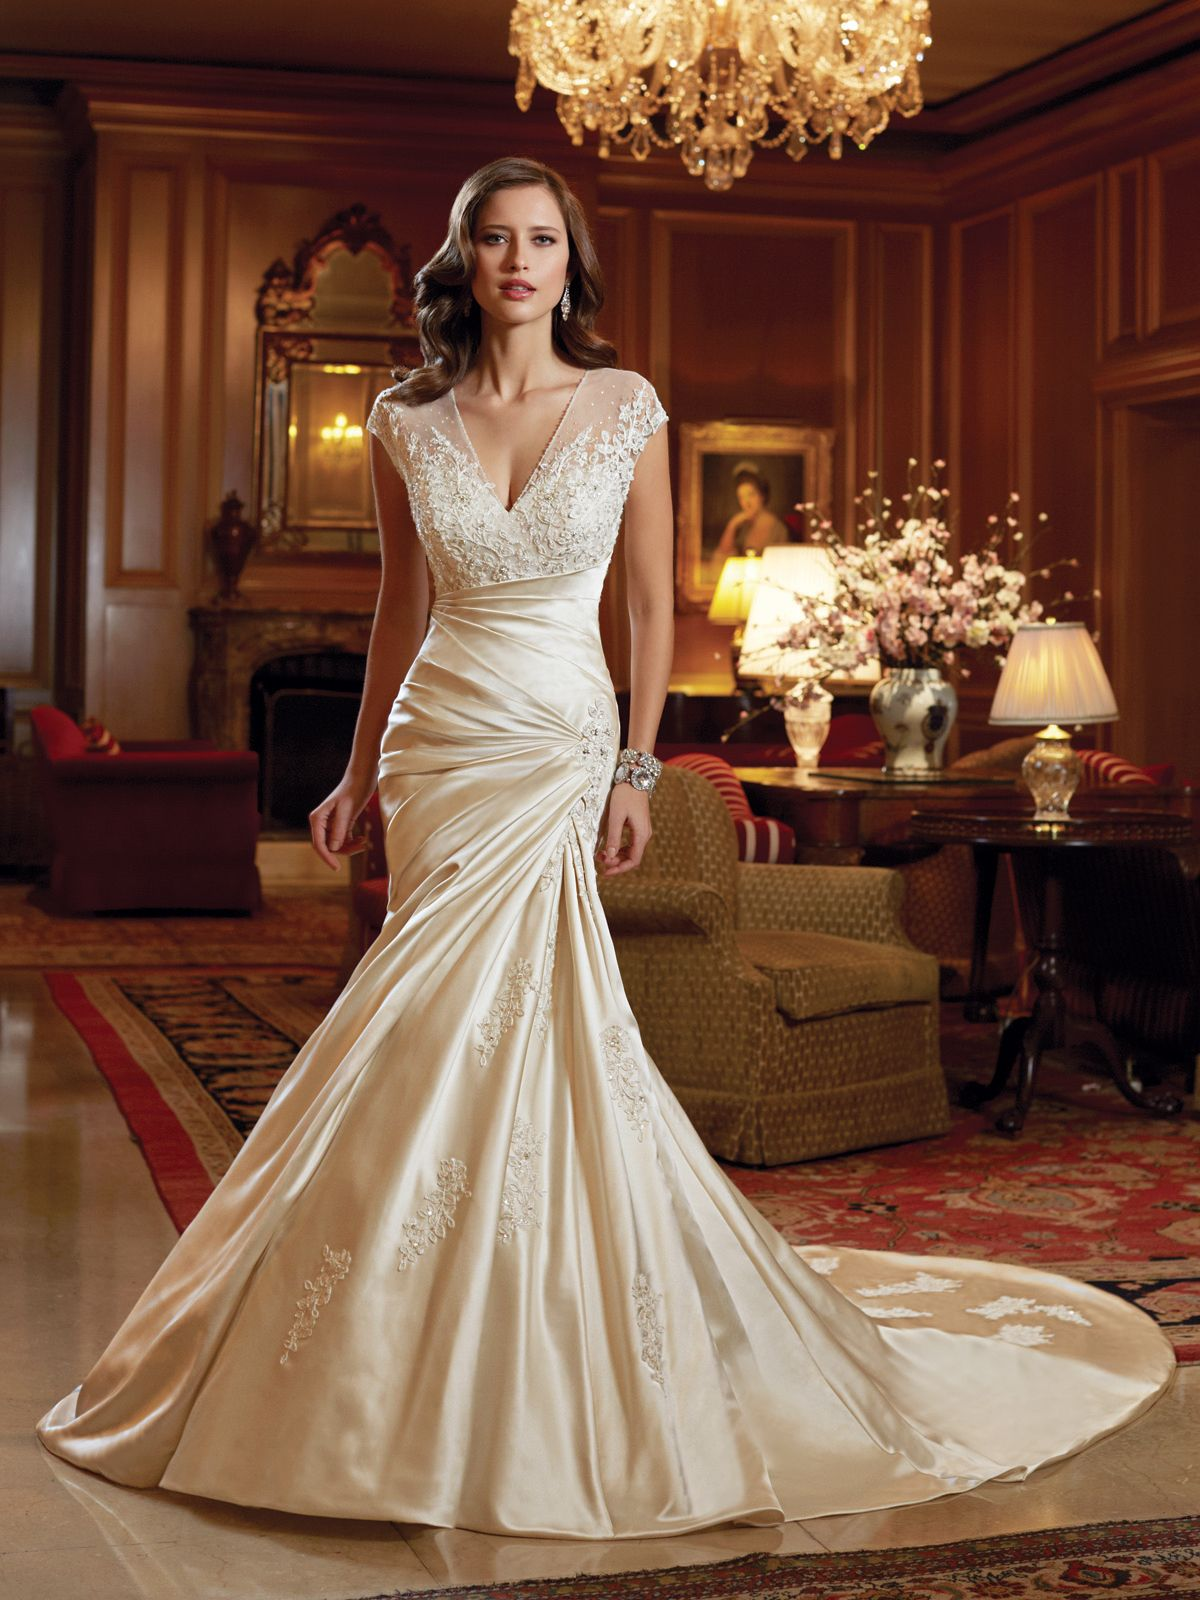 Danielle\'s Bridal Salt Lake City, Utah #ST01009   Sophia Tolli ...